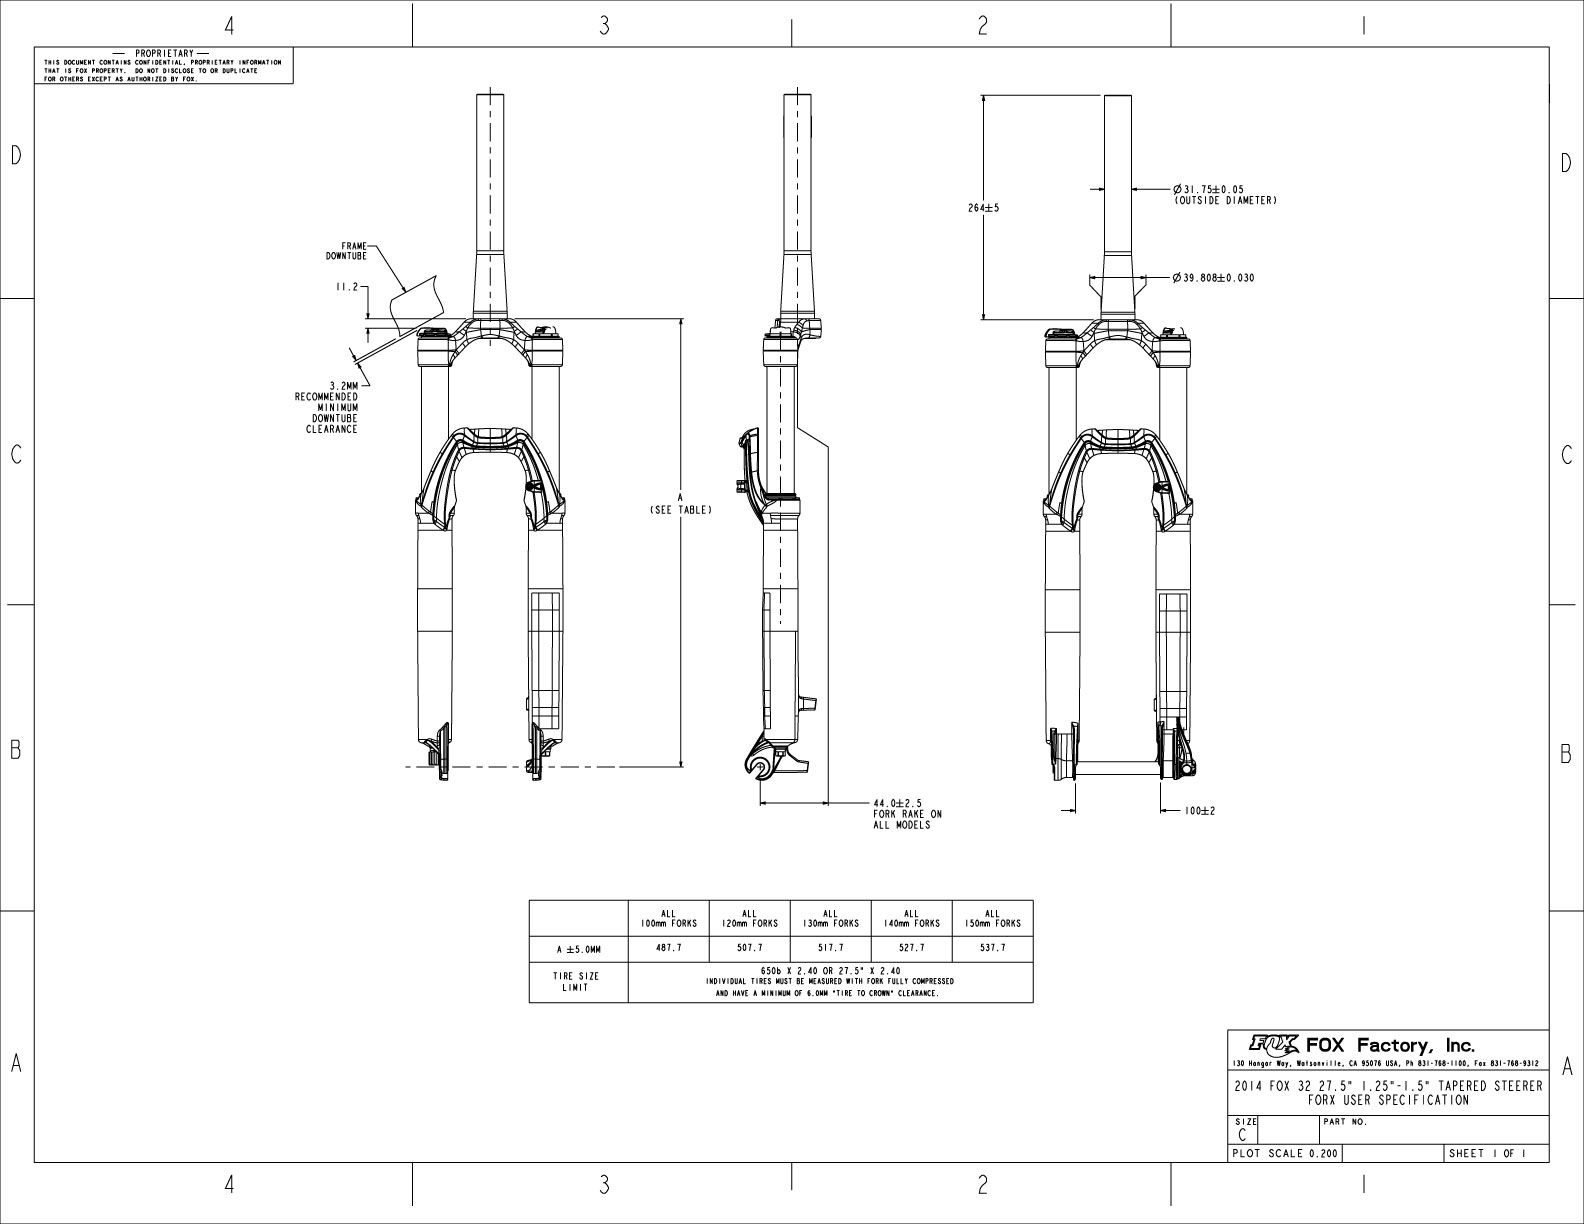 Bike Pump Diagram Wire Data Schema Lowcostvoltageregulator Powersupplycircuit Circuit Diagrams With Fork Of The Bicycle Diy Enthusiasts Wiring U2022 Rh Broadwaycomputers Us